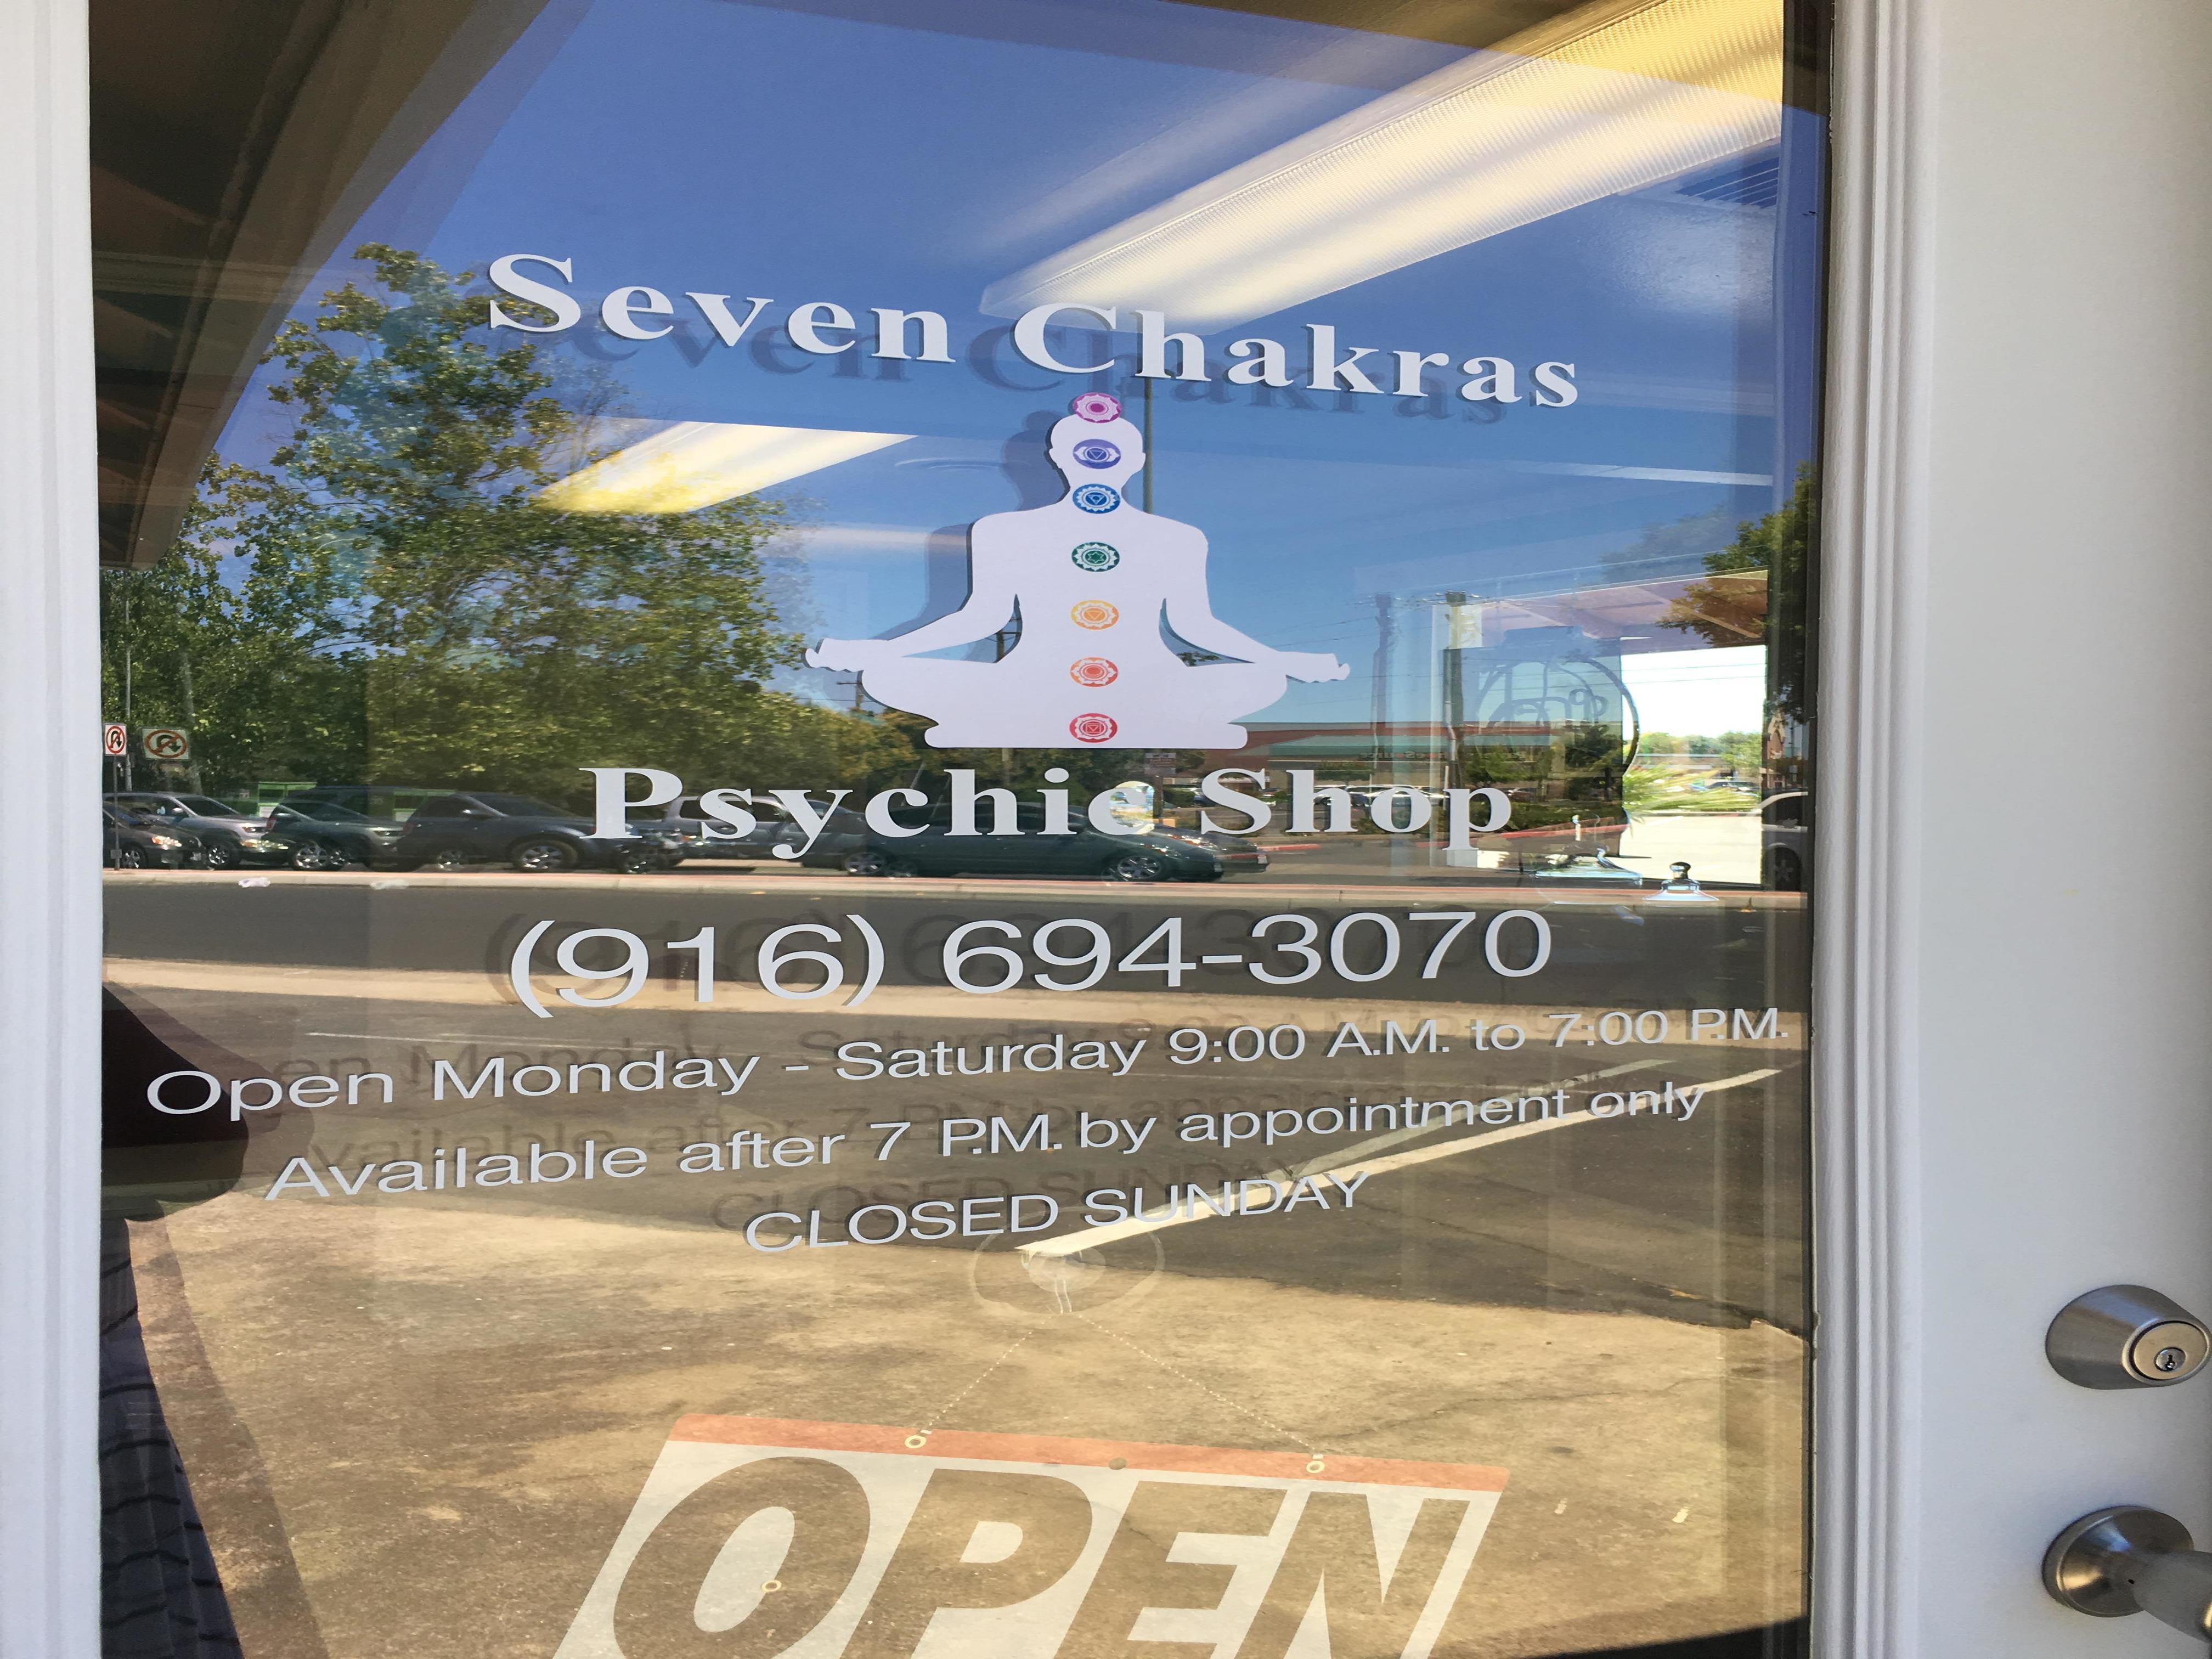 Seven chakras psychic shop image 0